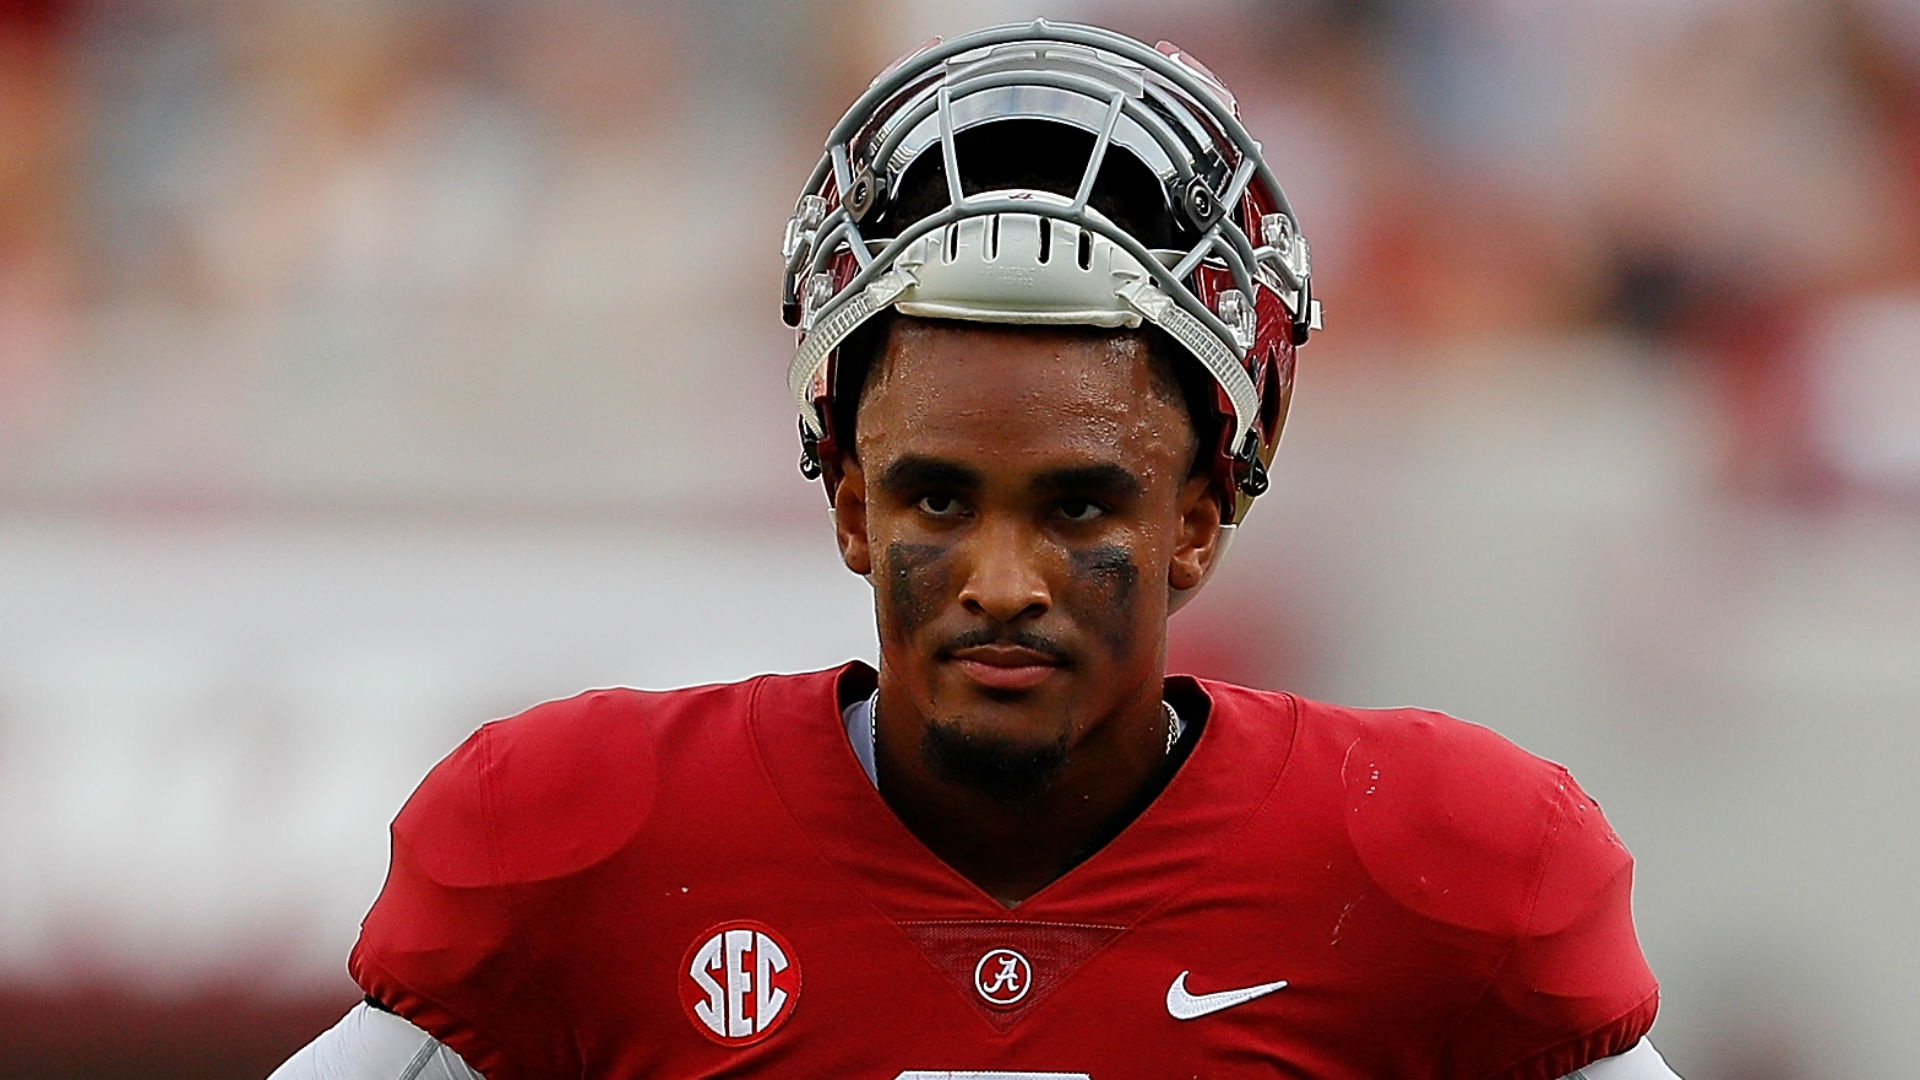 Jalen Hurts injury update: Alabama QB injured ankle vs. Tennessee, underwent minor surgery